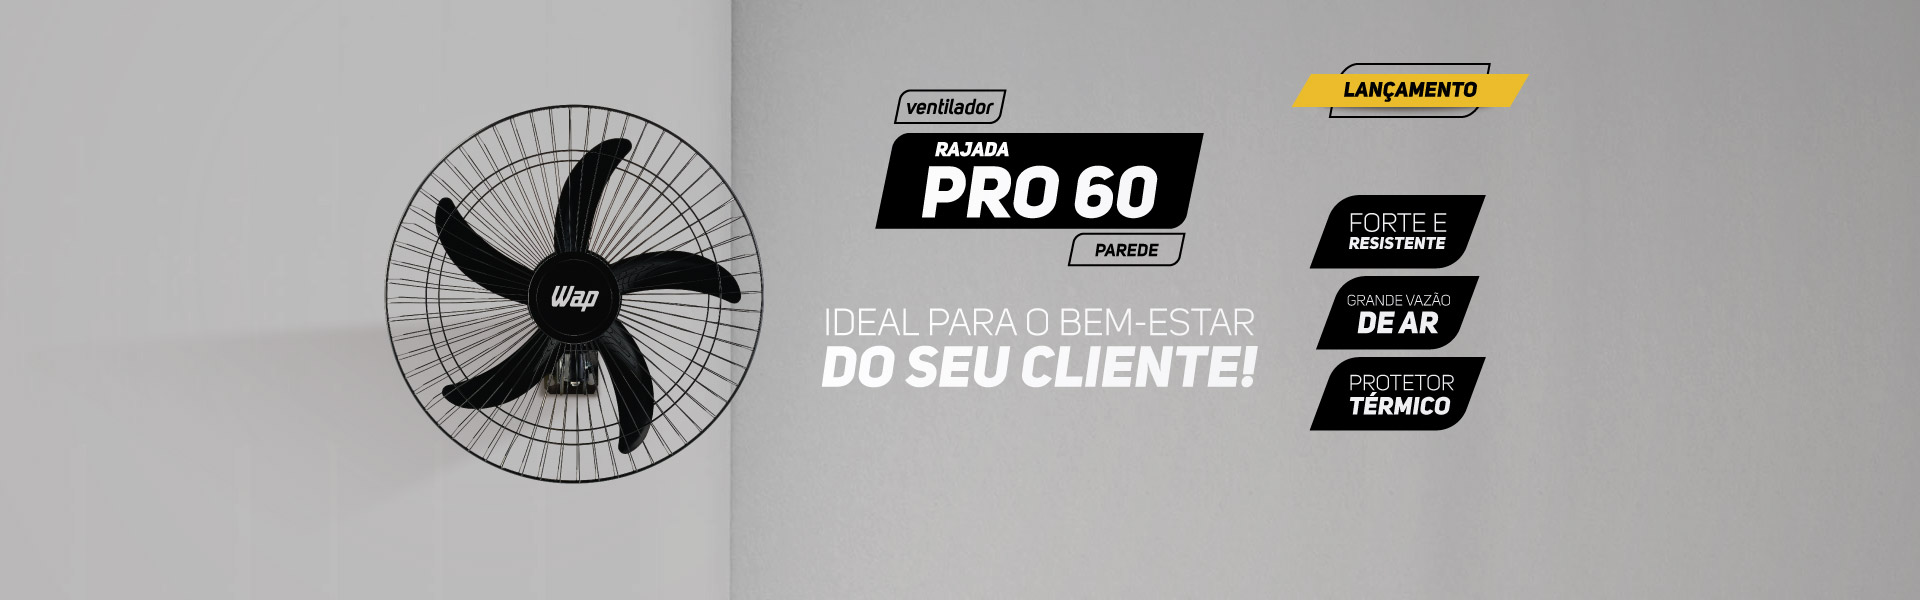 ventilador-rajada-pro-60-parede